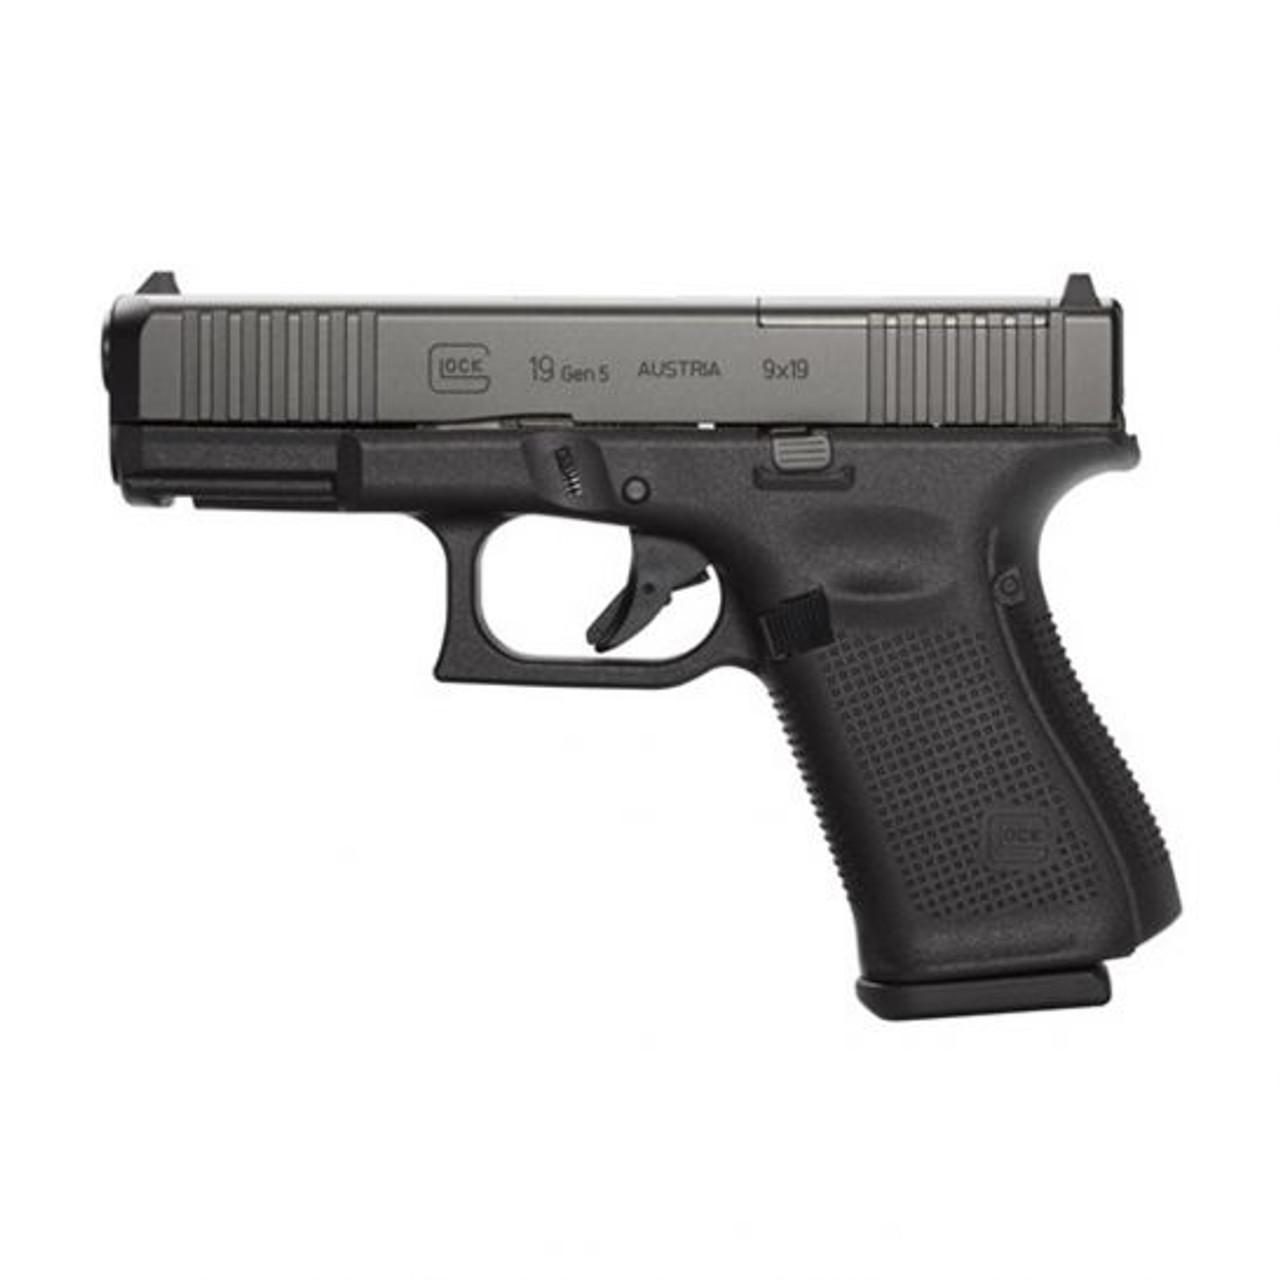 Glock G19 GEN5 MOS Front Serrations / Black